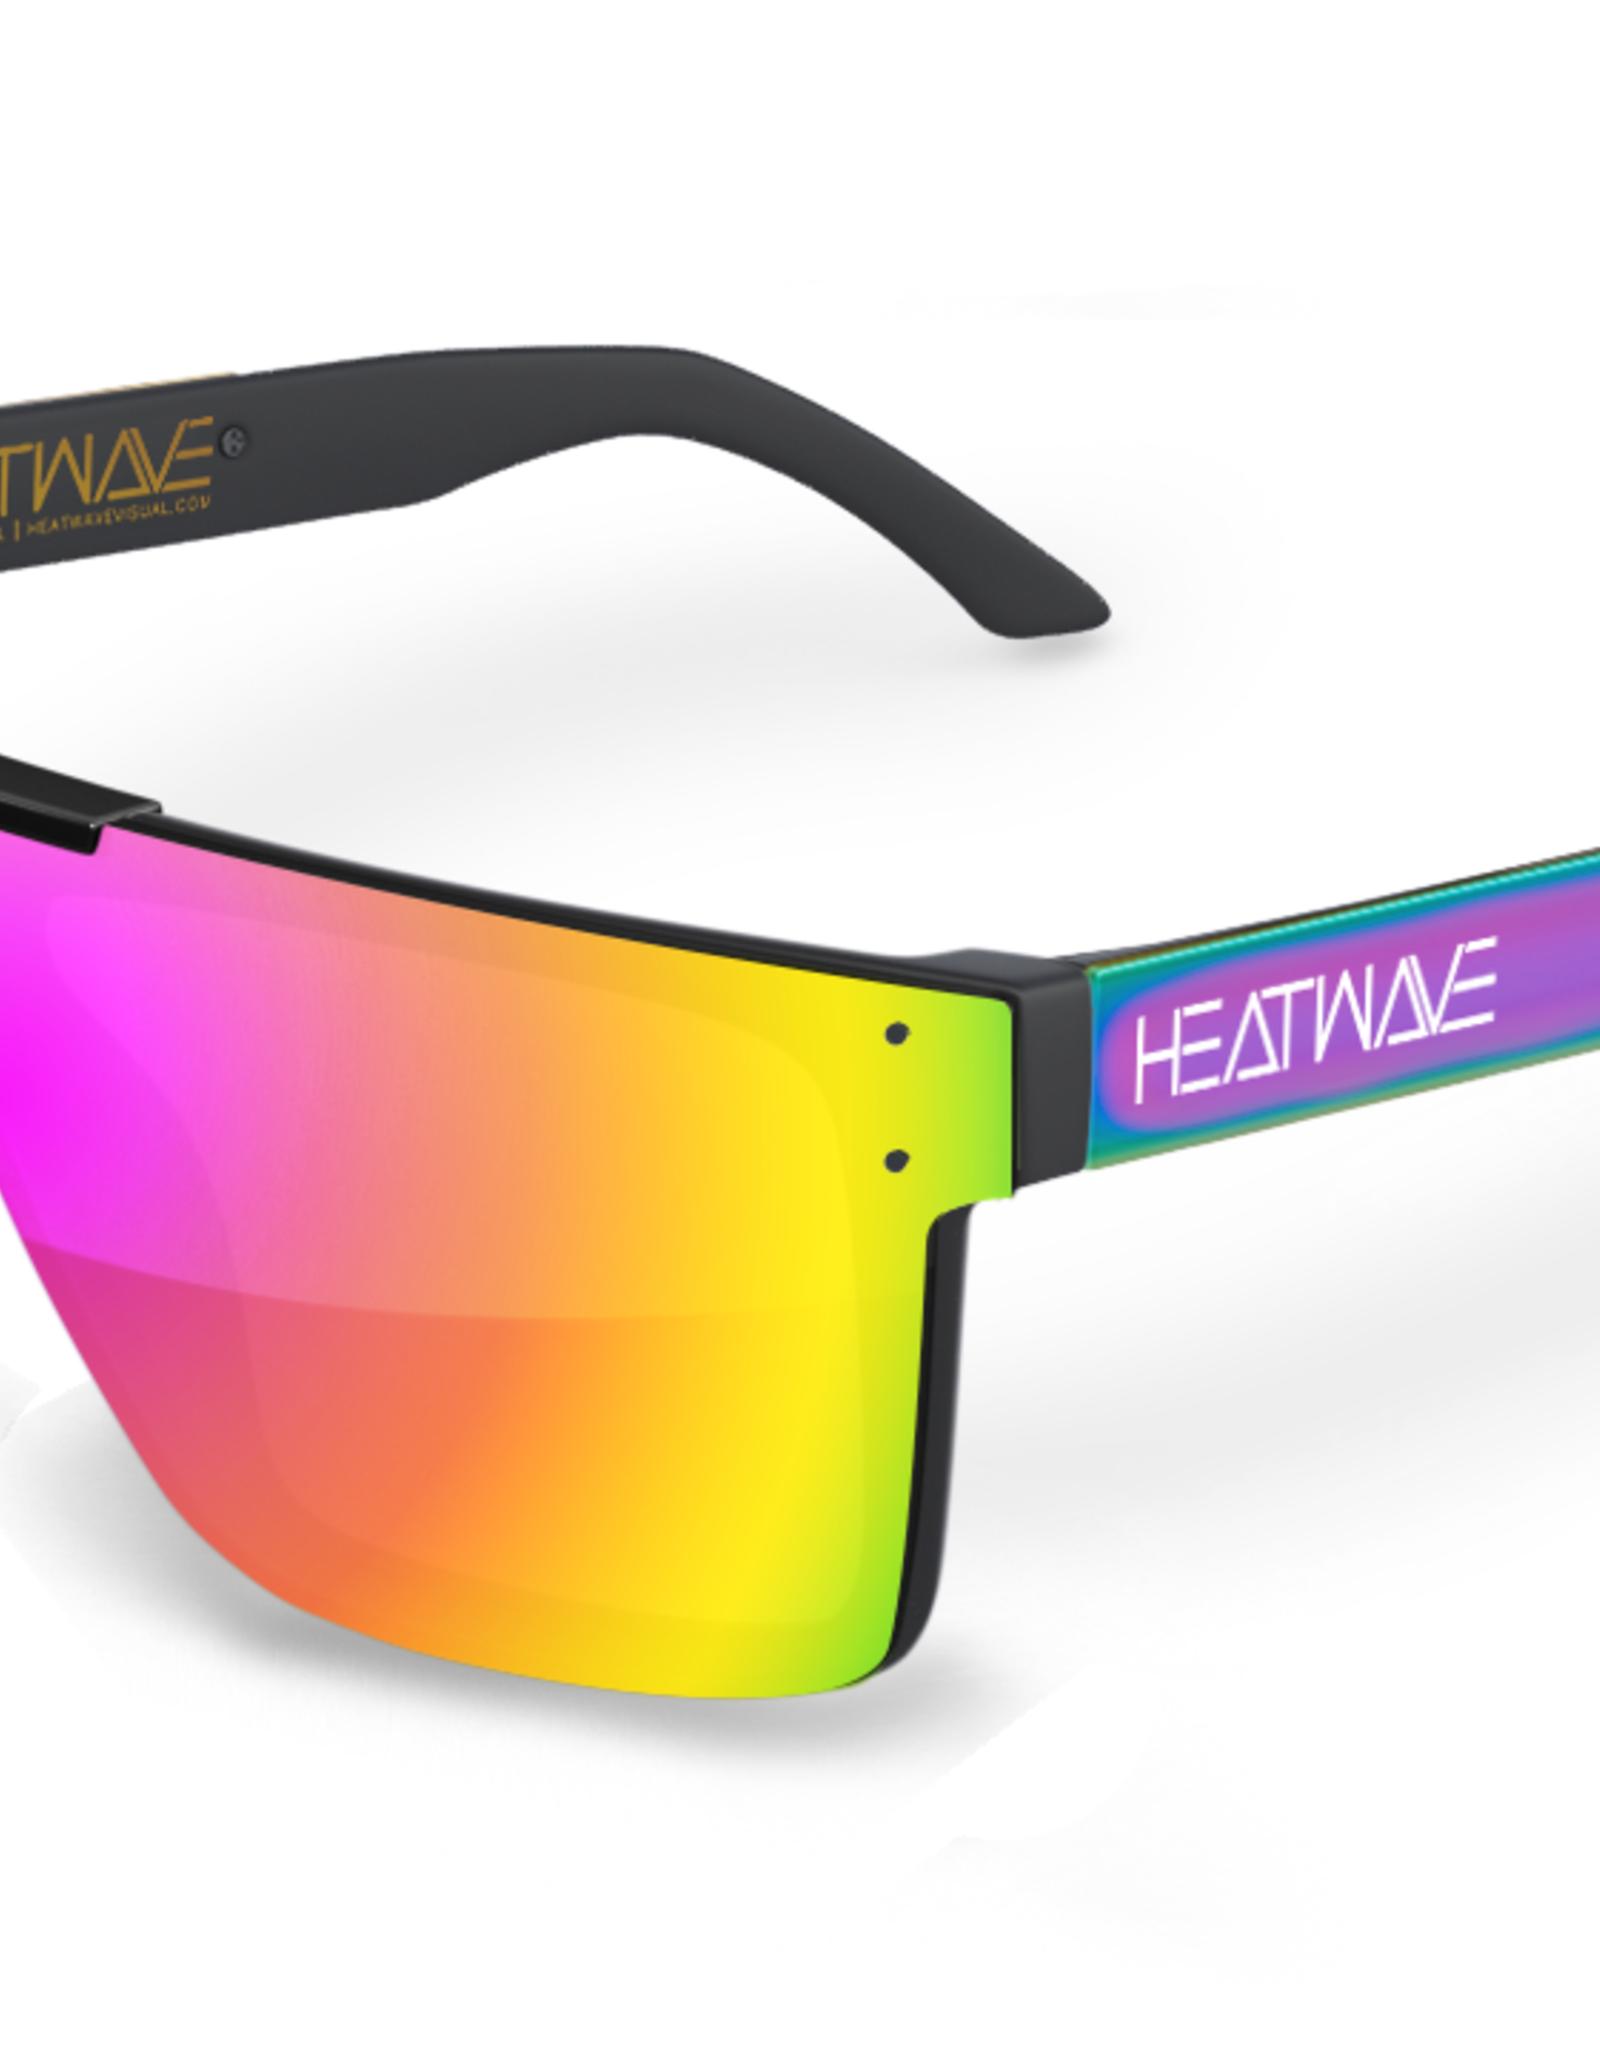 Heatwave Visual Heatwave - QUATRO (Z80.3) - Metal Neon Spectrum